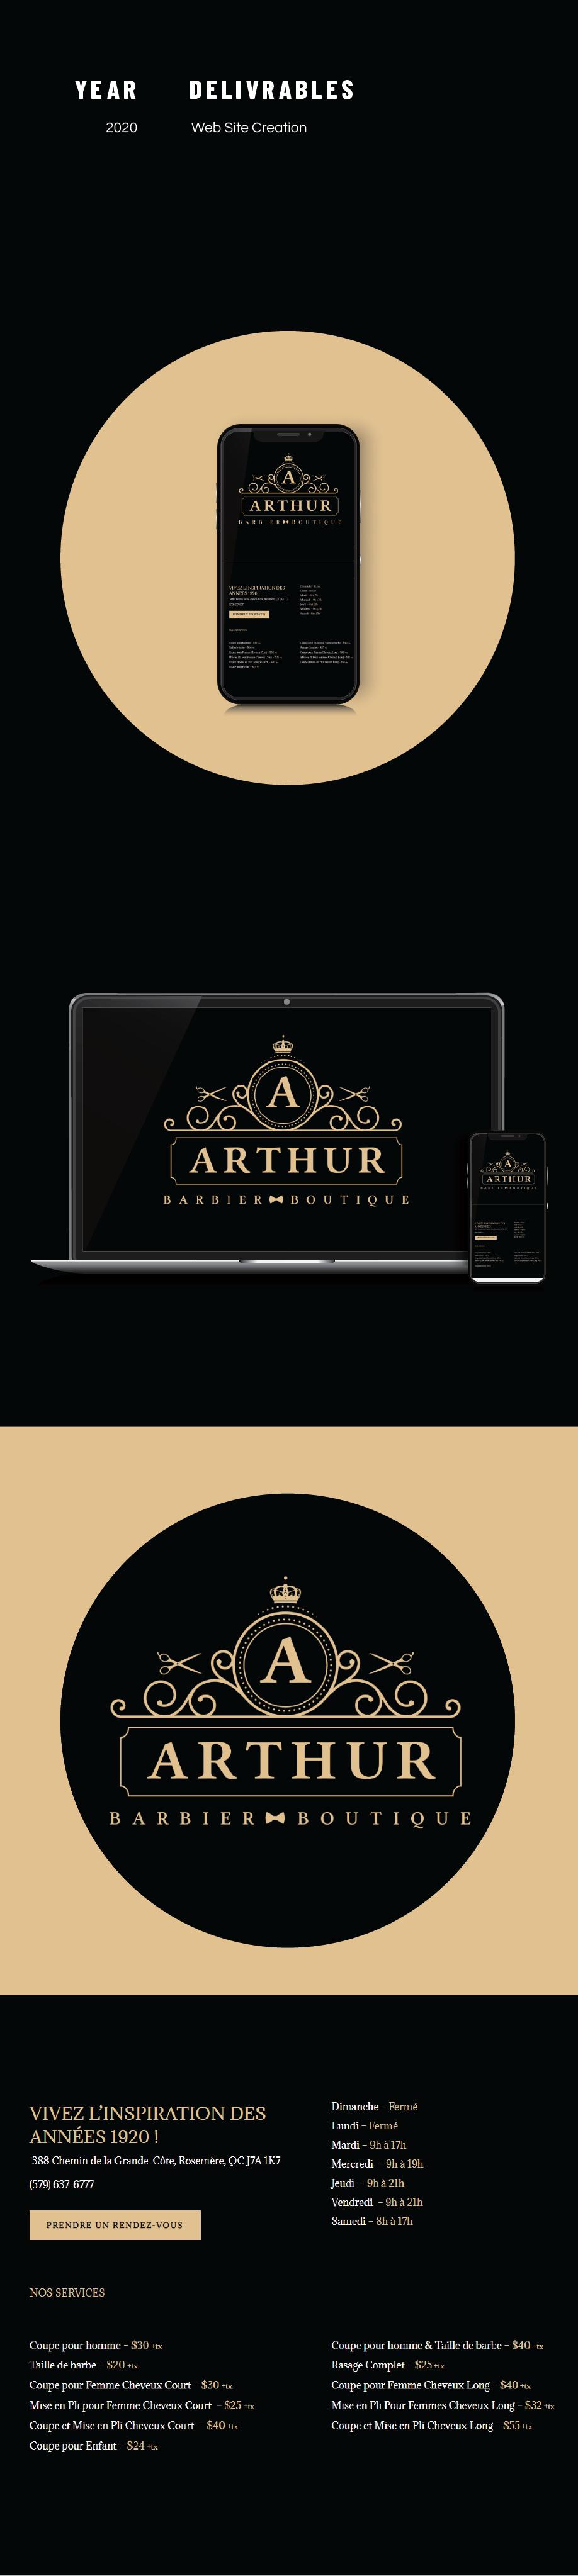 ARTHUR BARBIER